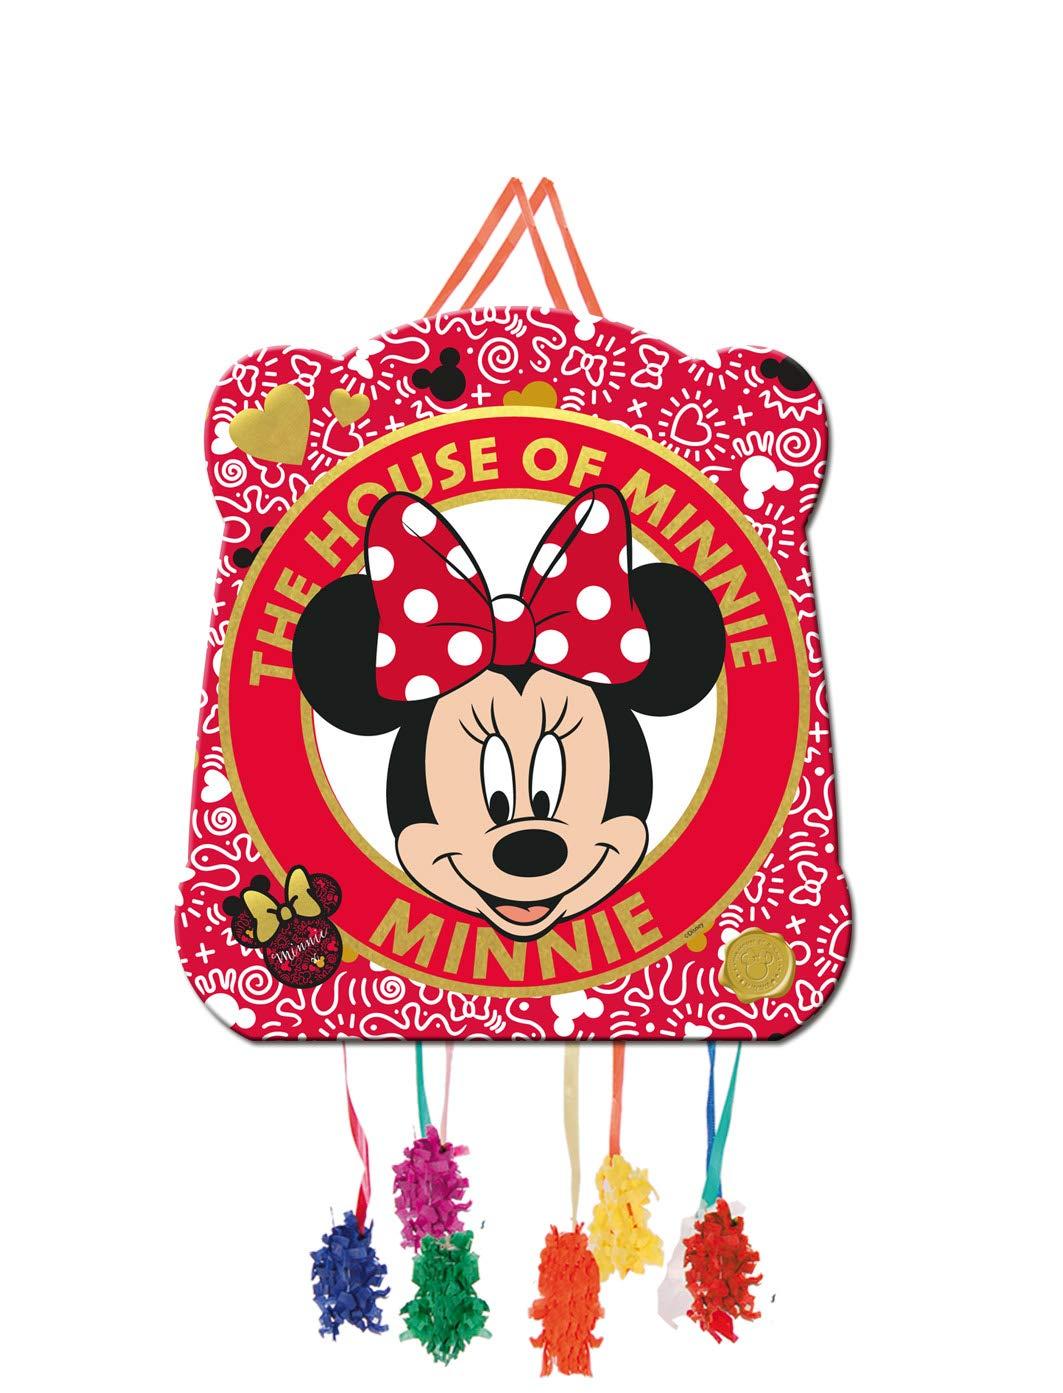 ALMACENESADAN 0821, Piñata Basic Disney Minnie Mouse,, Fiestas y cumpleaños. 28x33 cms.